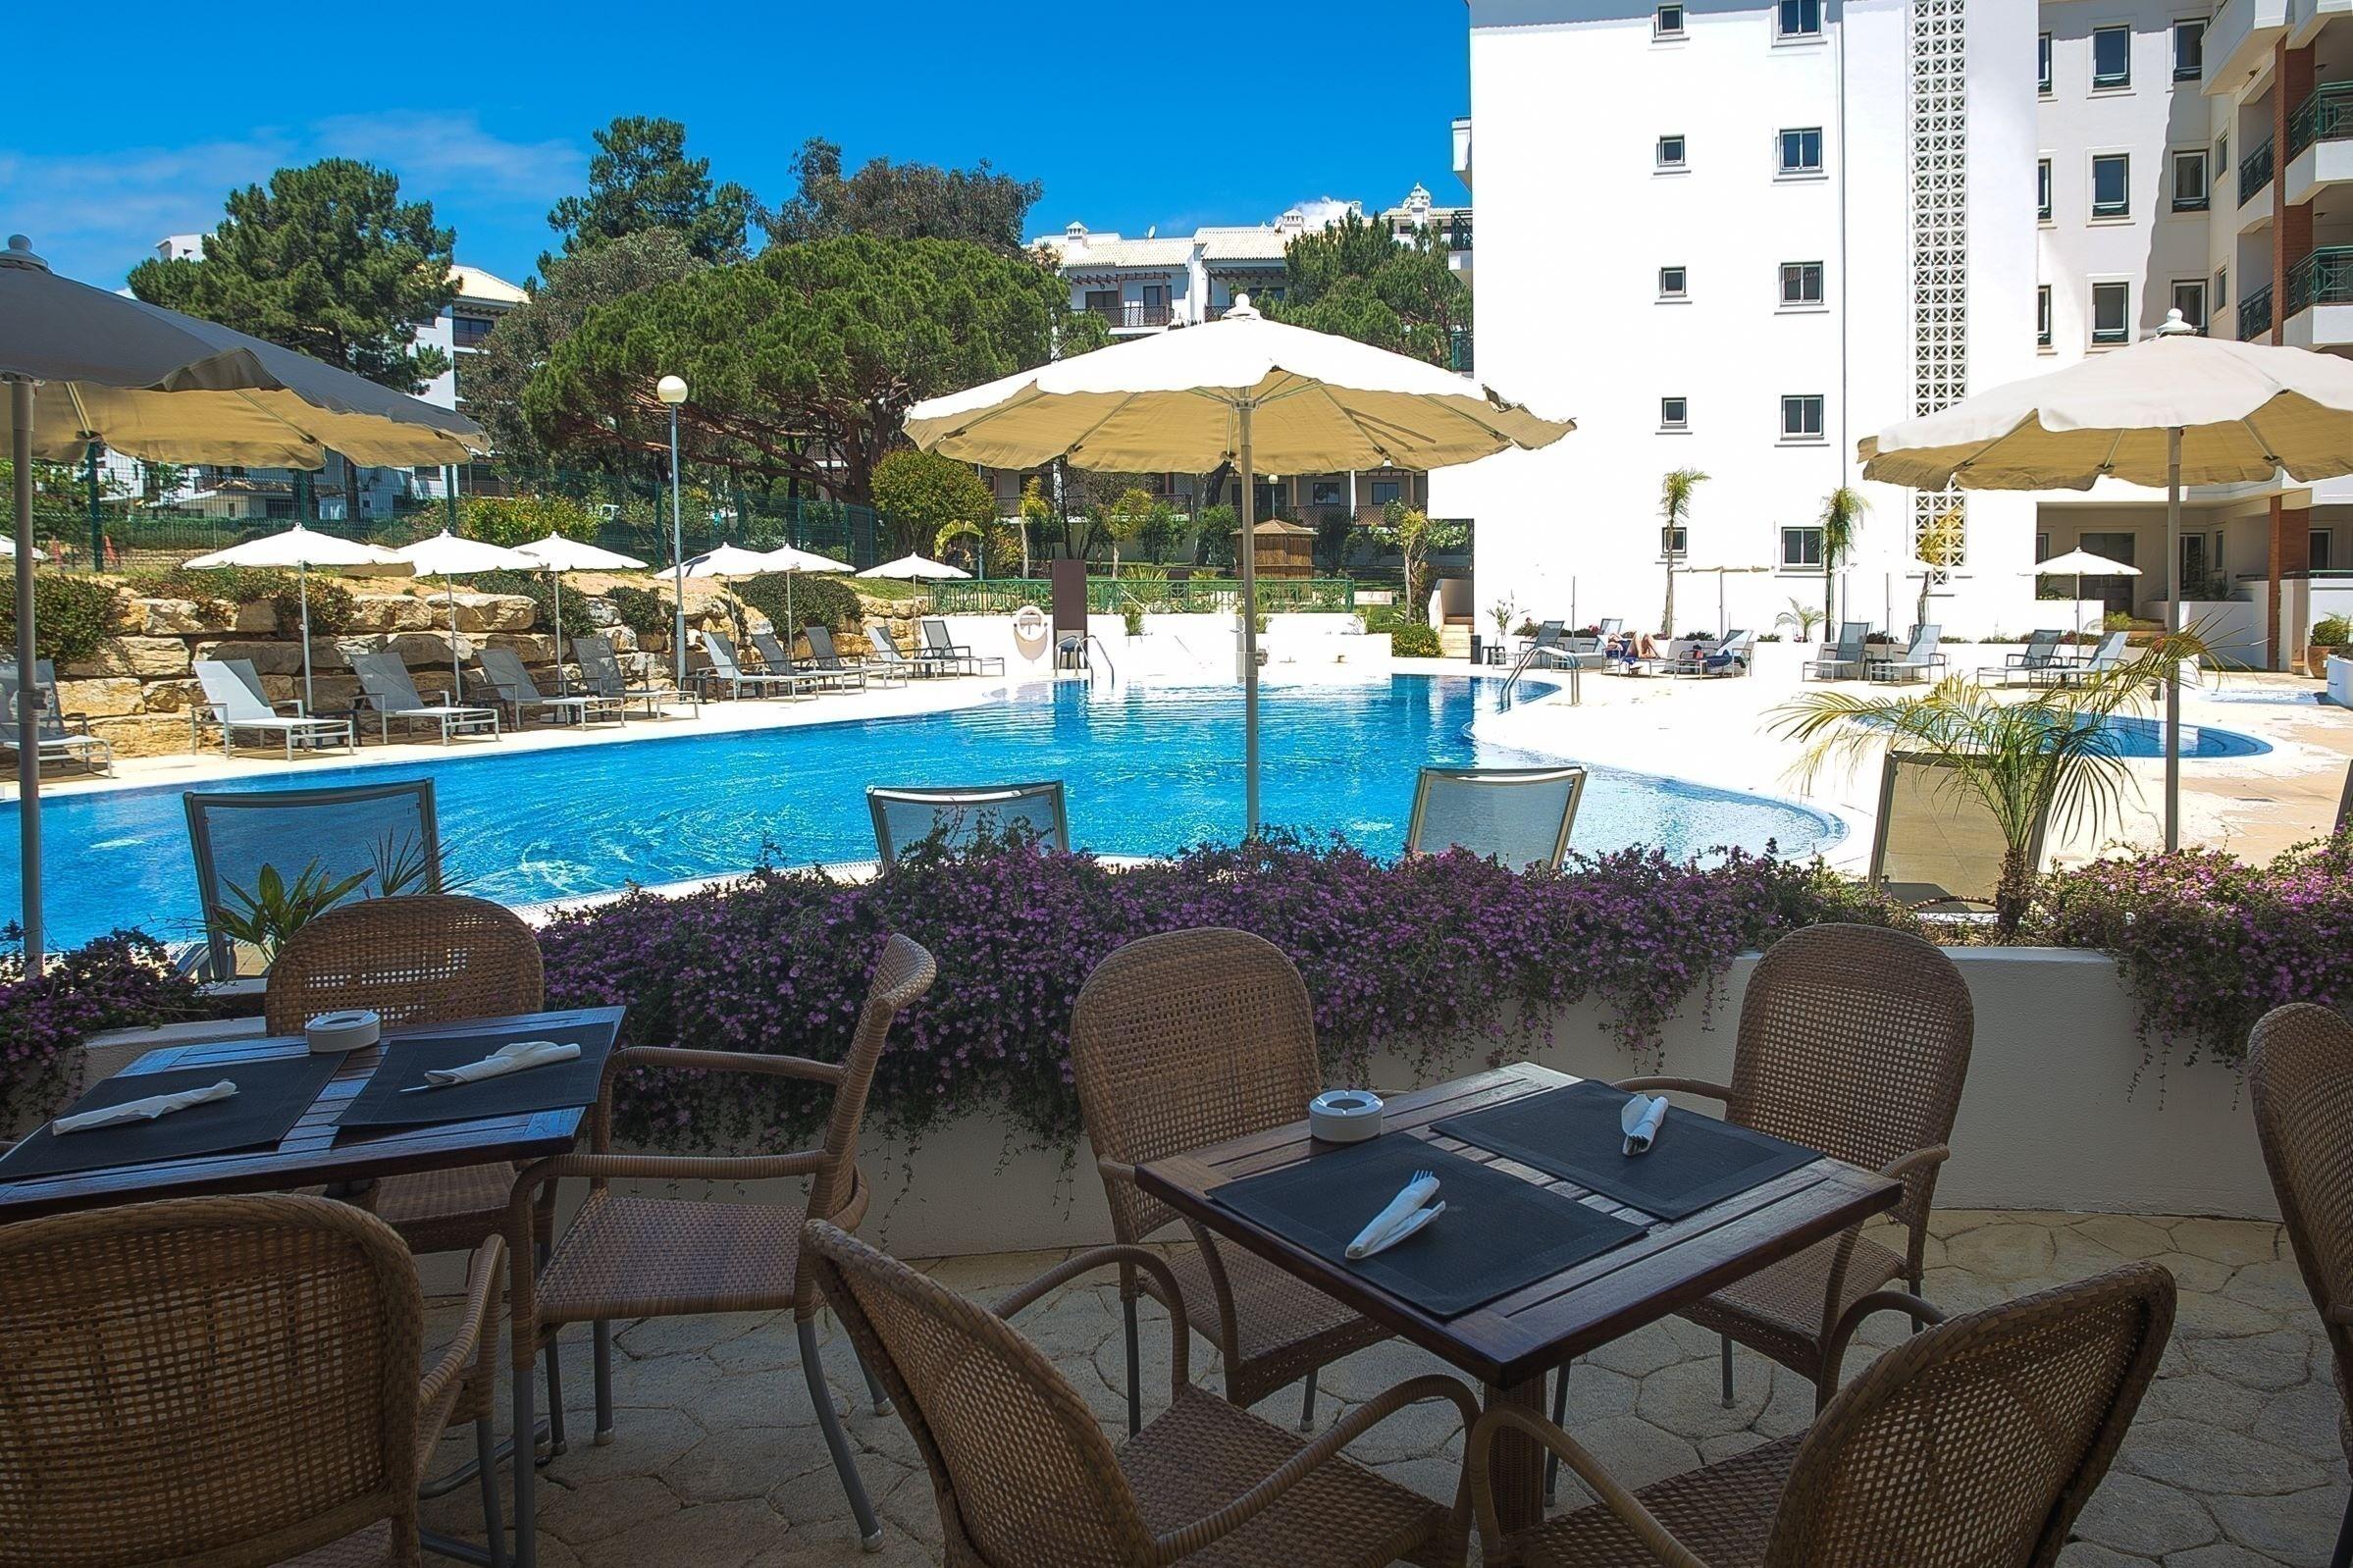 hotels/hotel_5/image_1.jpg